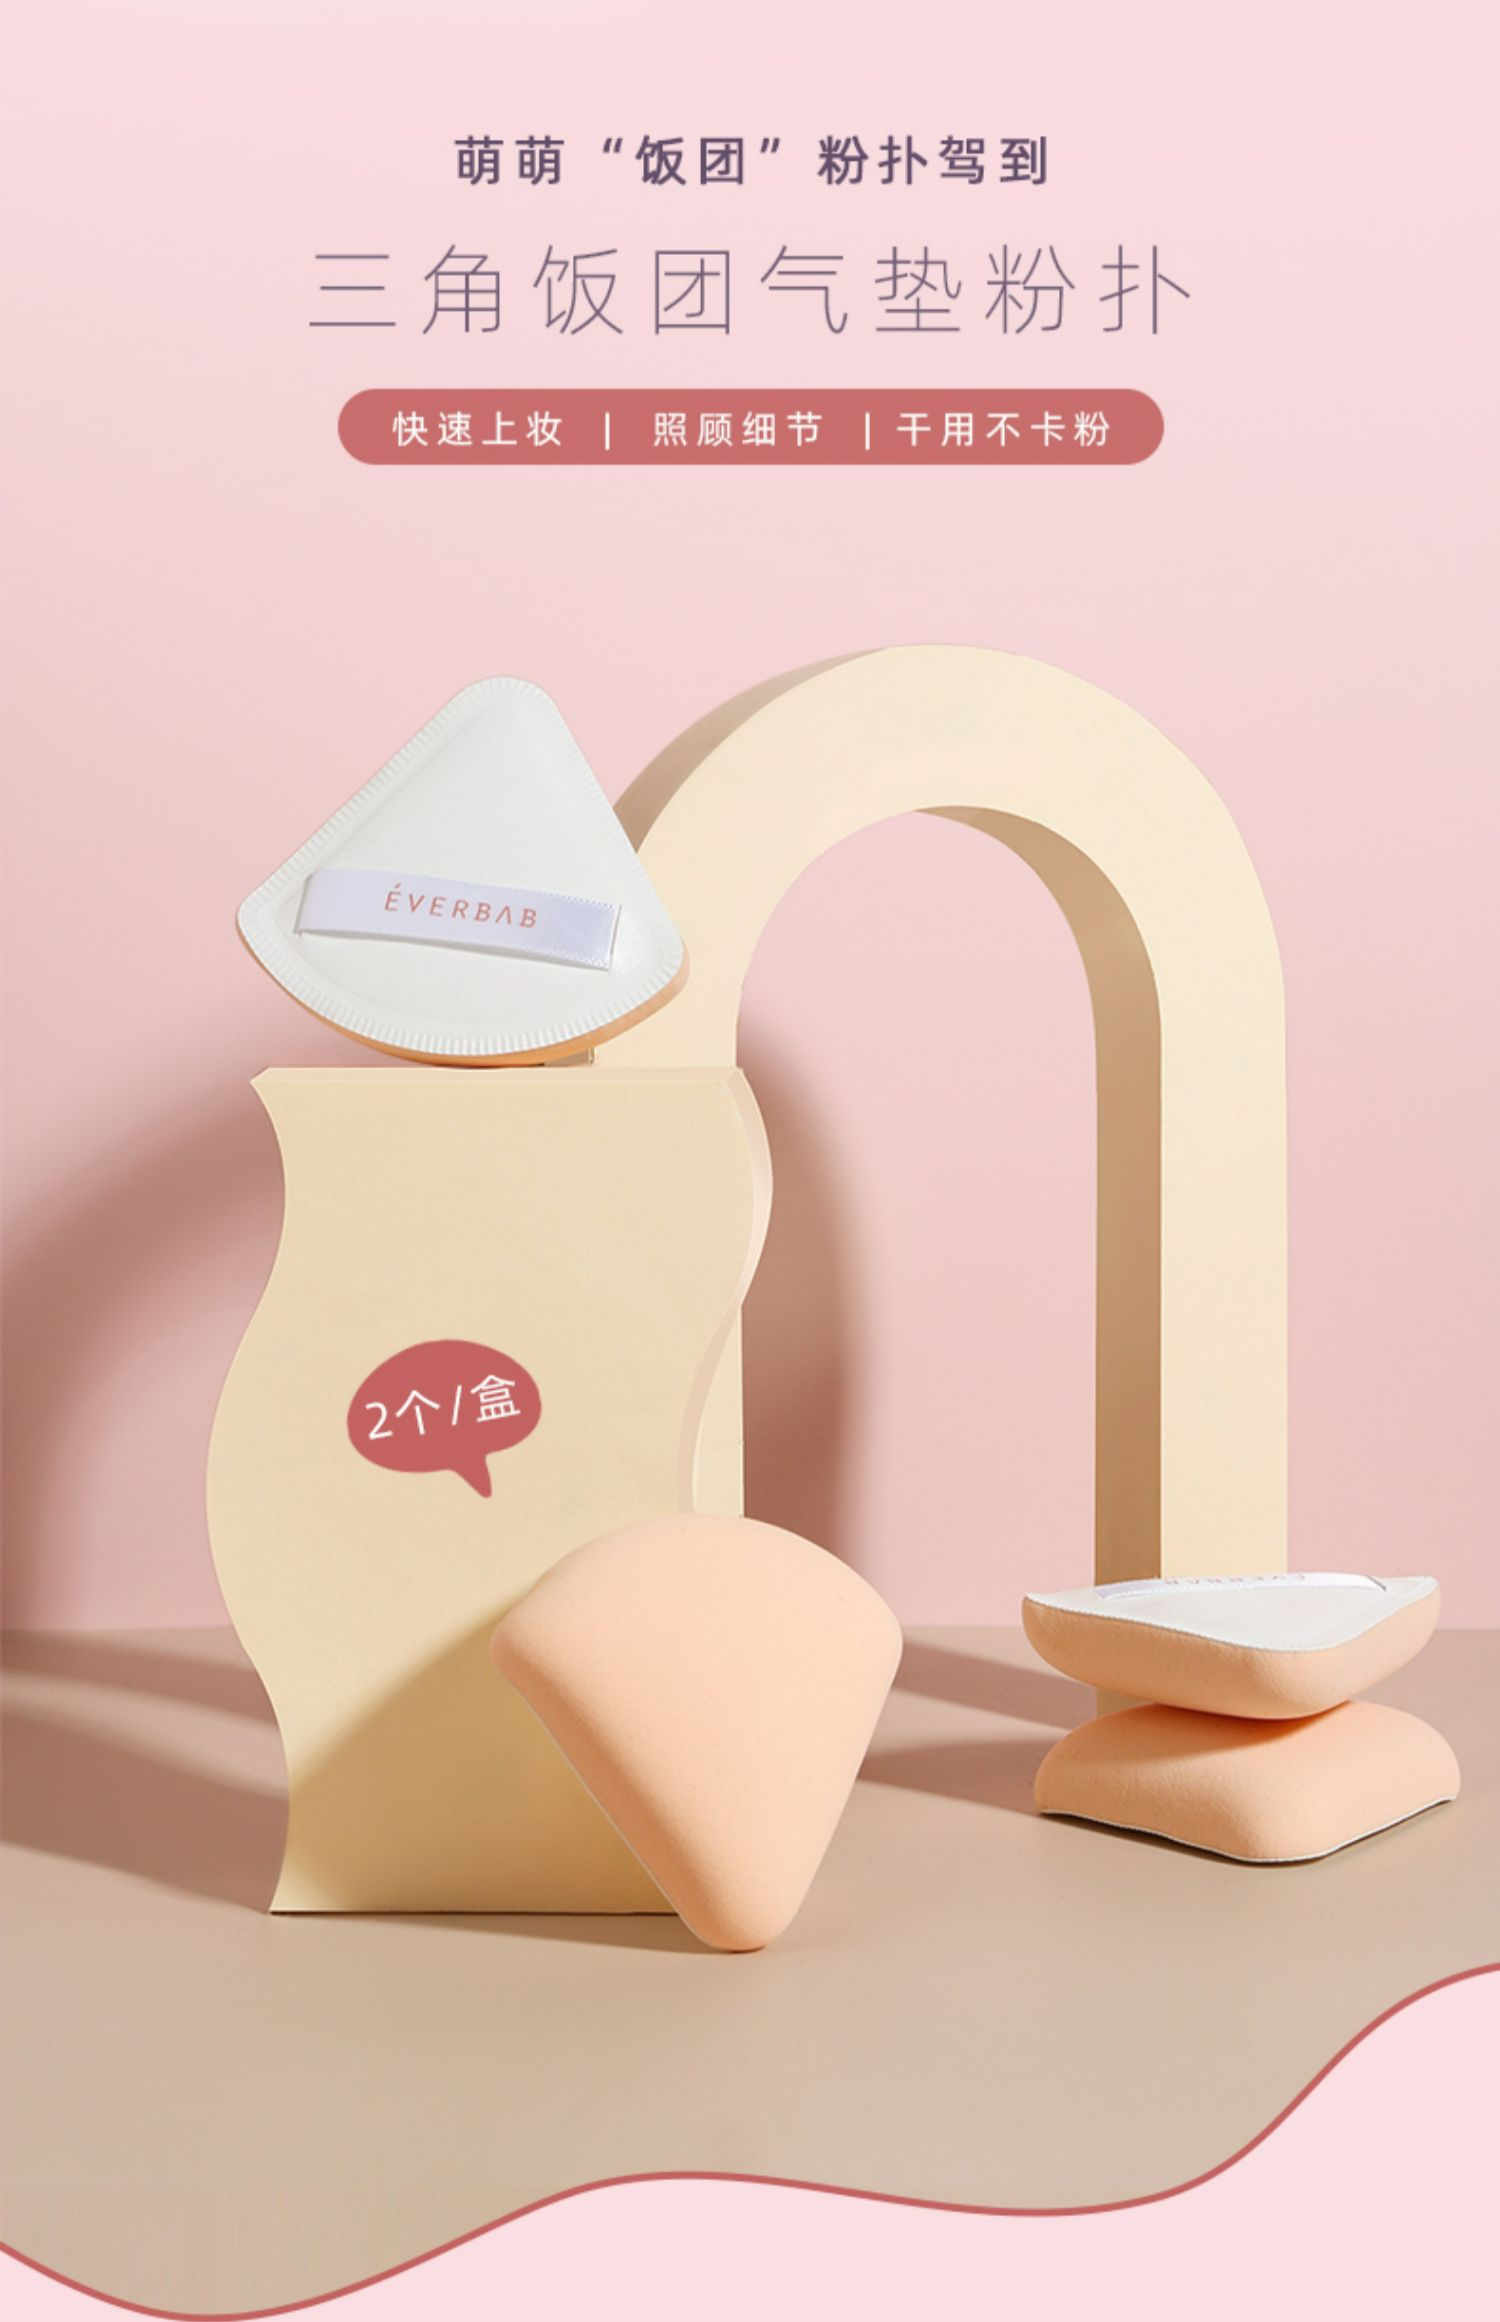 everbab棉花糖气垫粉扑粉饼扑2个装8